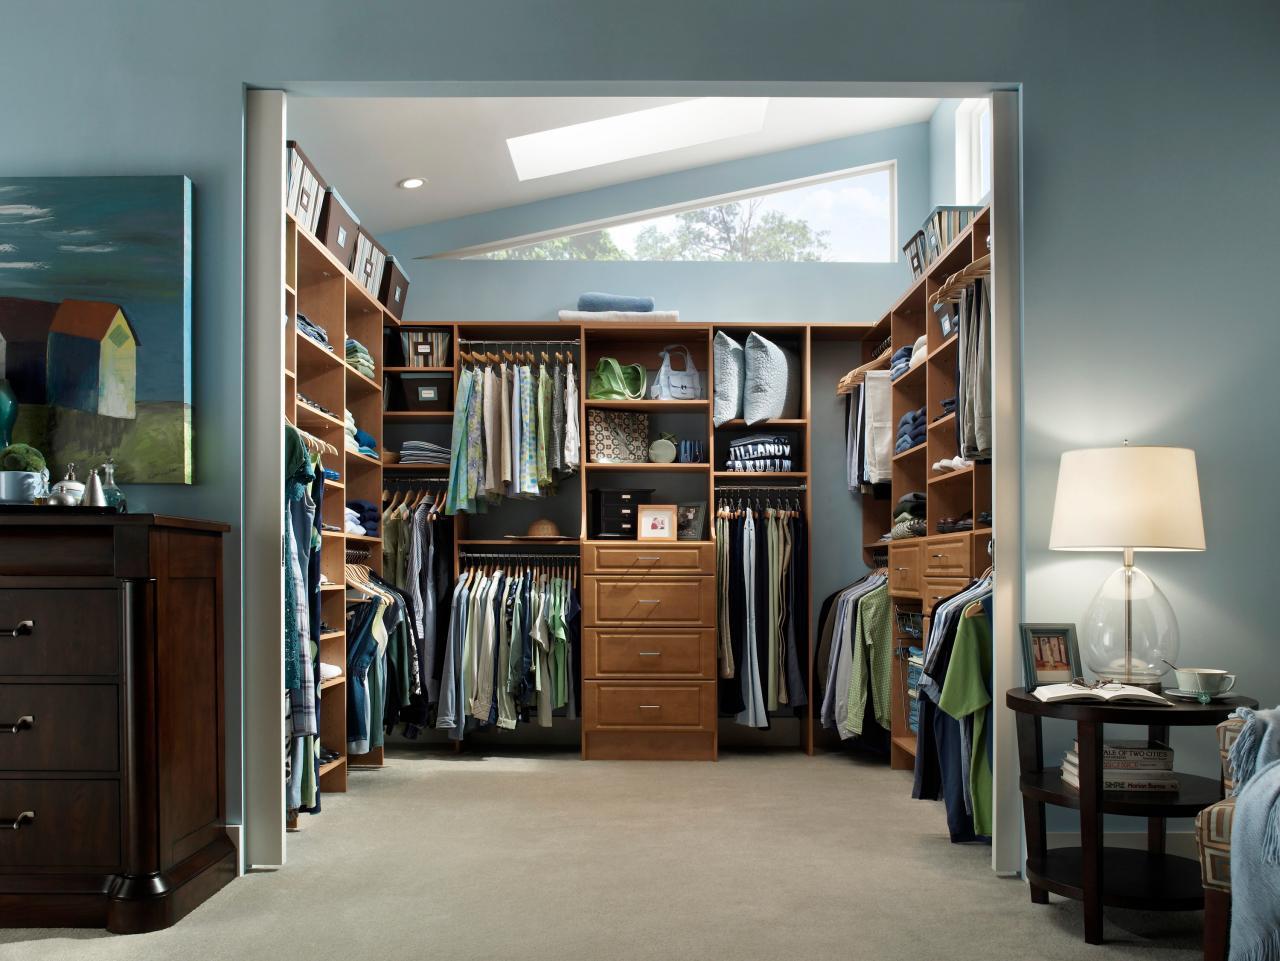 walkin closet best walk in closet designs pictures 27 in minimalist design room with walk SCNMXVL